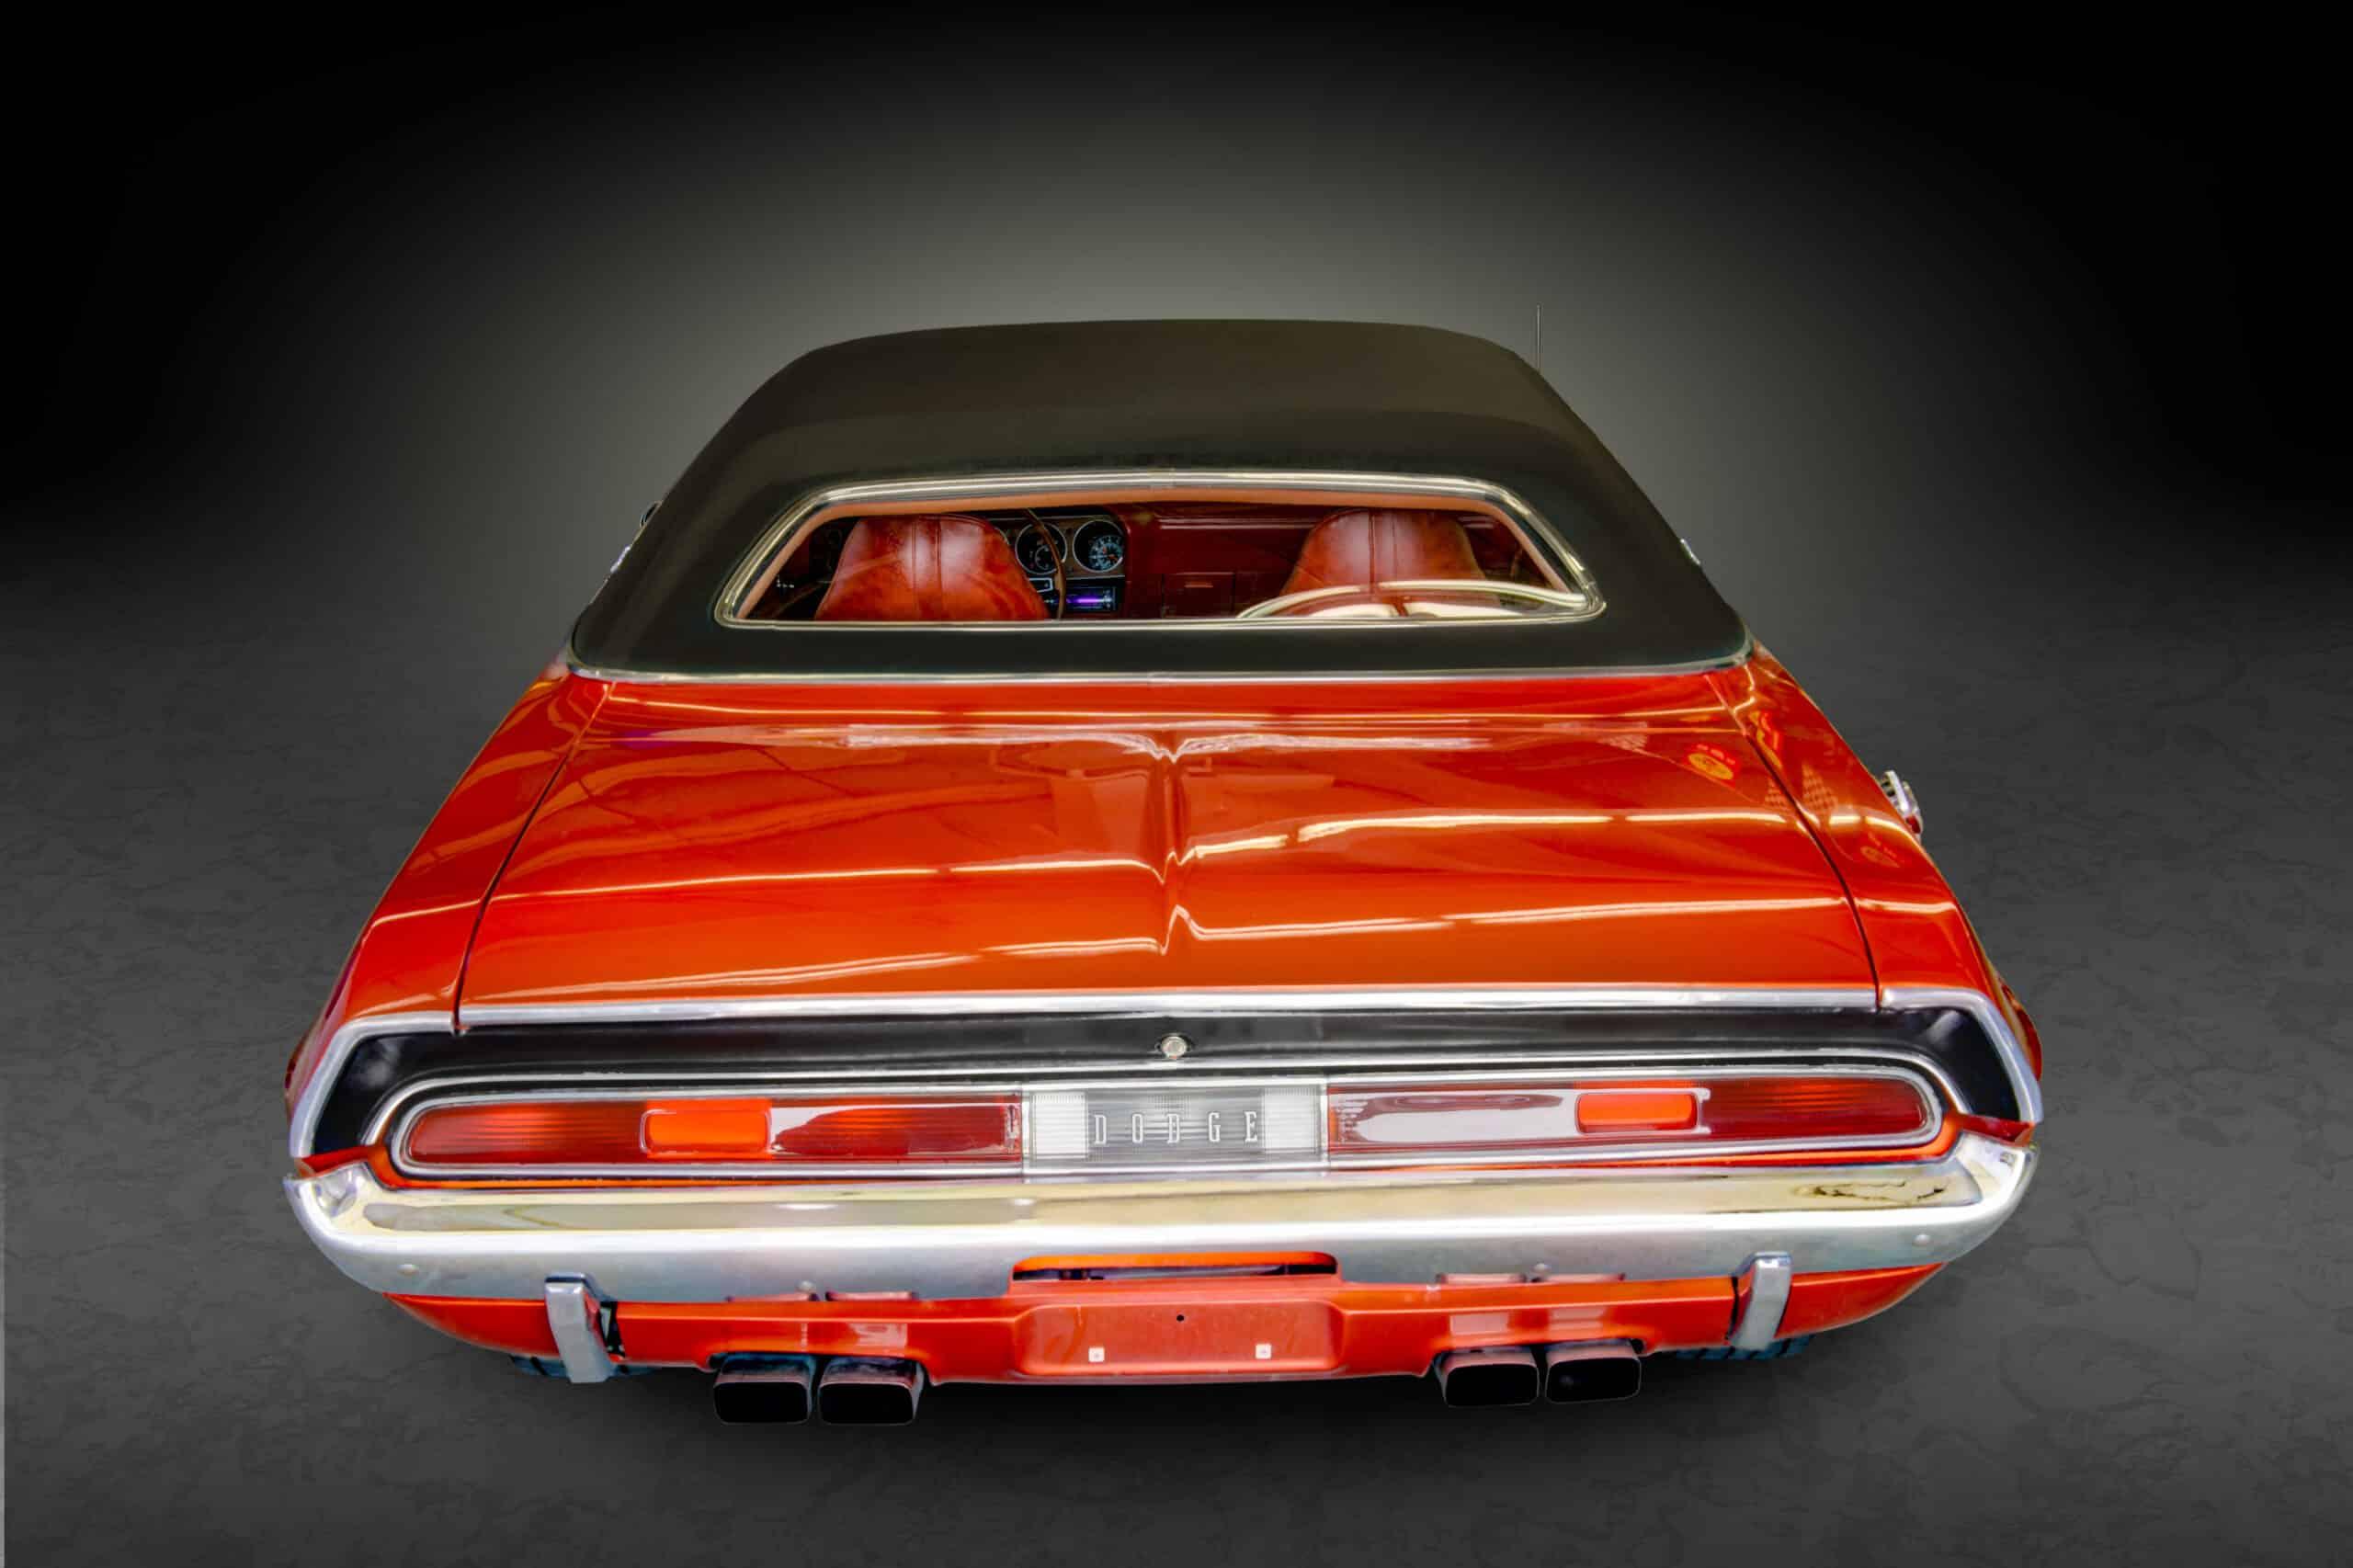 1970 Dodge Challenger Photos William Horton Photography